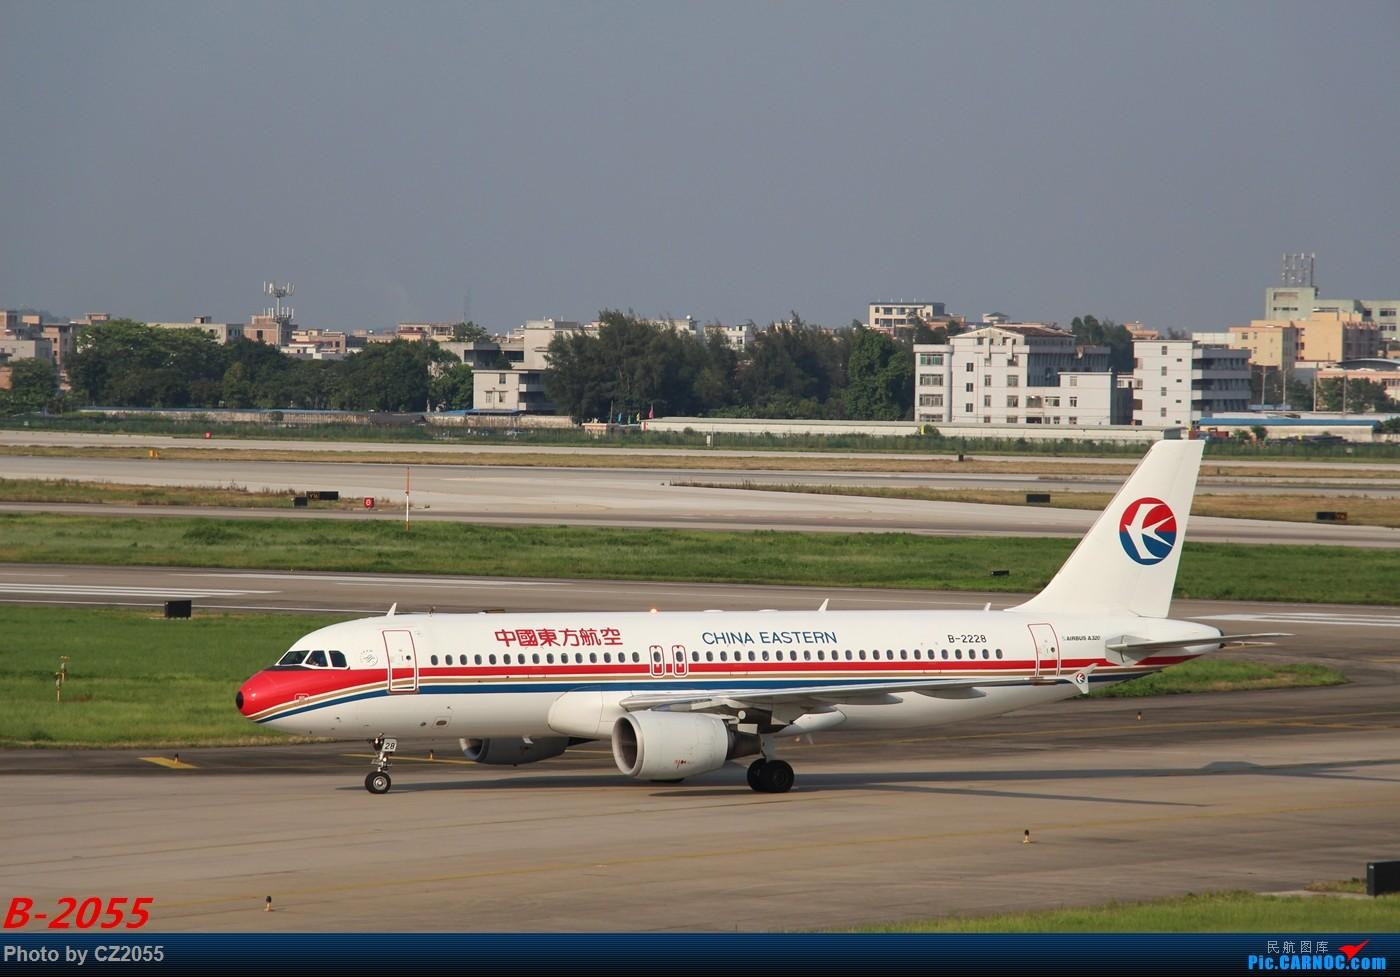 Re:[原创]Re:[原创]【广东青少年拍机小队】【C-Z-2055】发完737和宽体就升级320,那就再发一组320系列。 AIRBUS A320-200 B-2228 中国广州白云国际机场